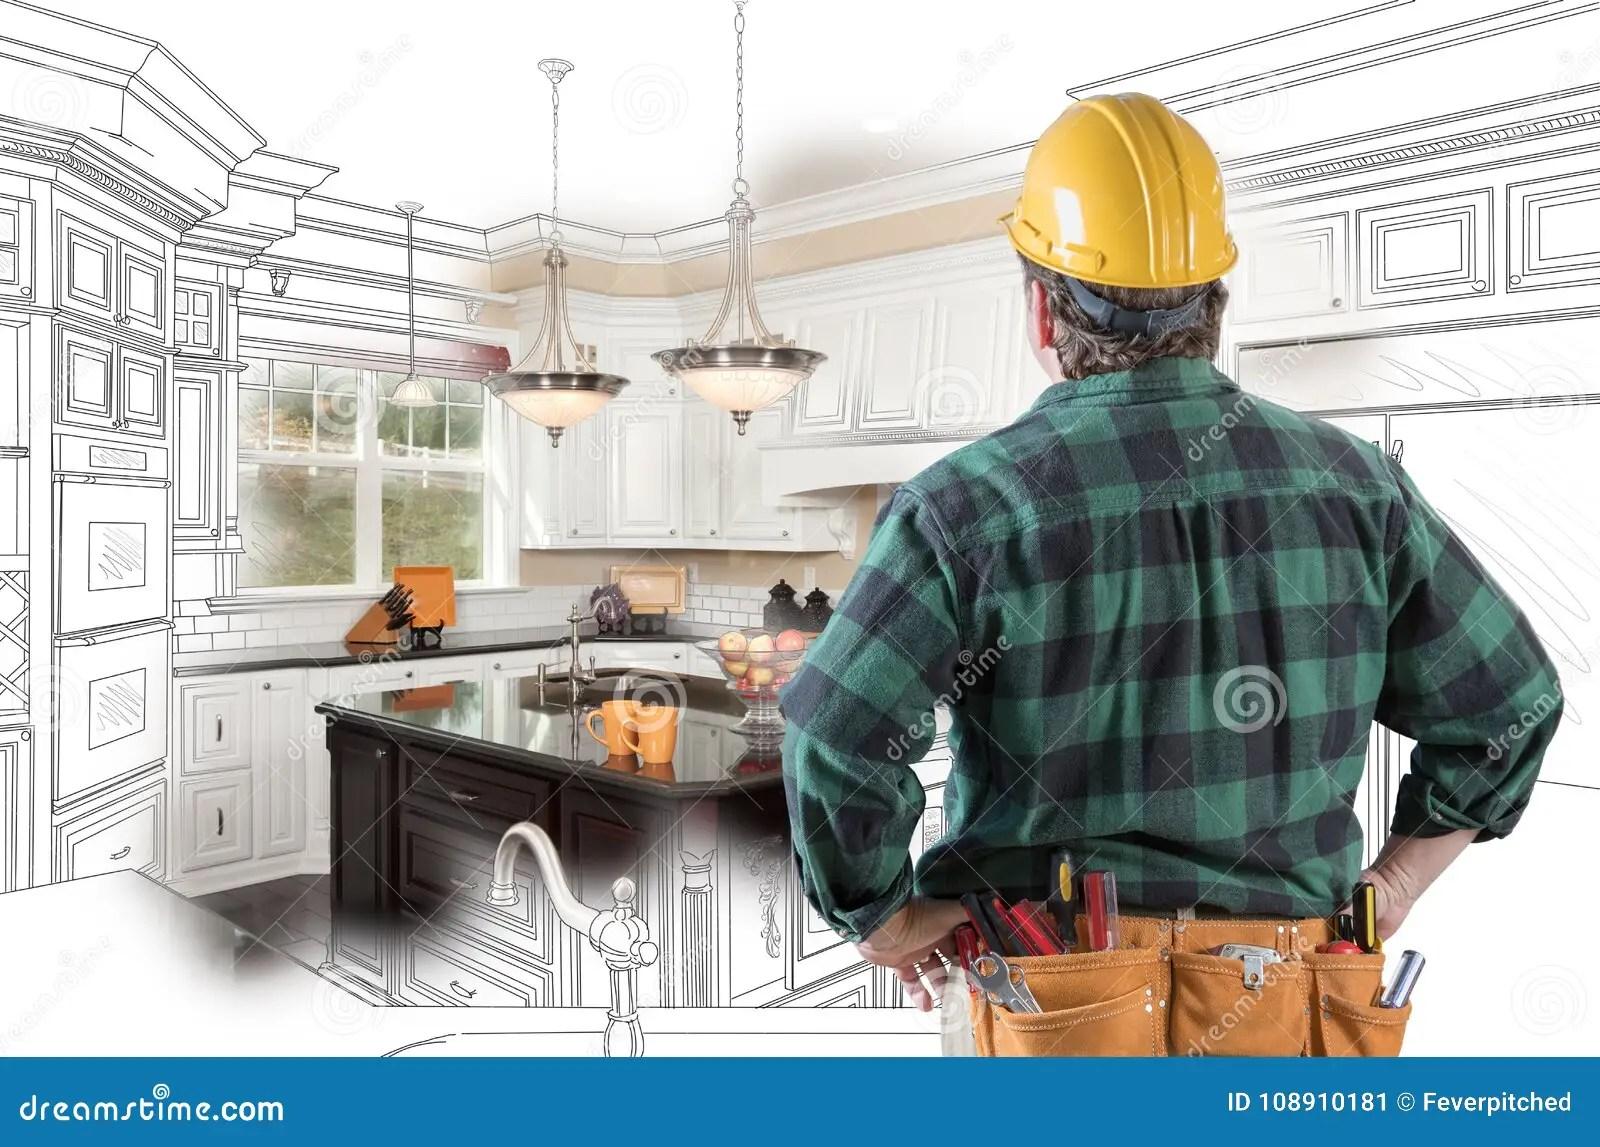 kitchen design tools rustic cart 与安全帽 工具传送带的公承包商看厨房设计库存图片 图片包括有庄园 工具传送带的公承包商看厨房设计